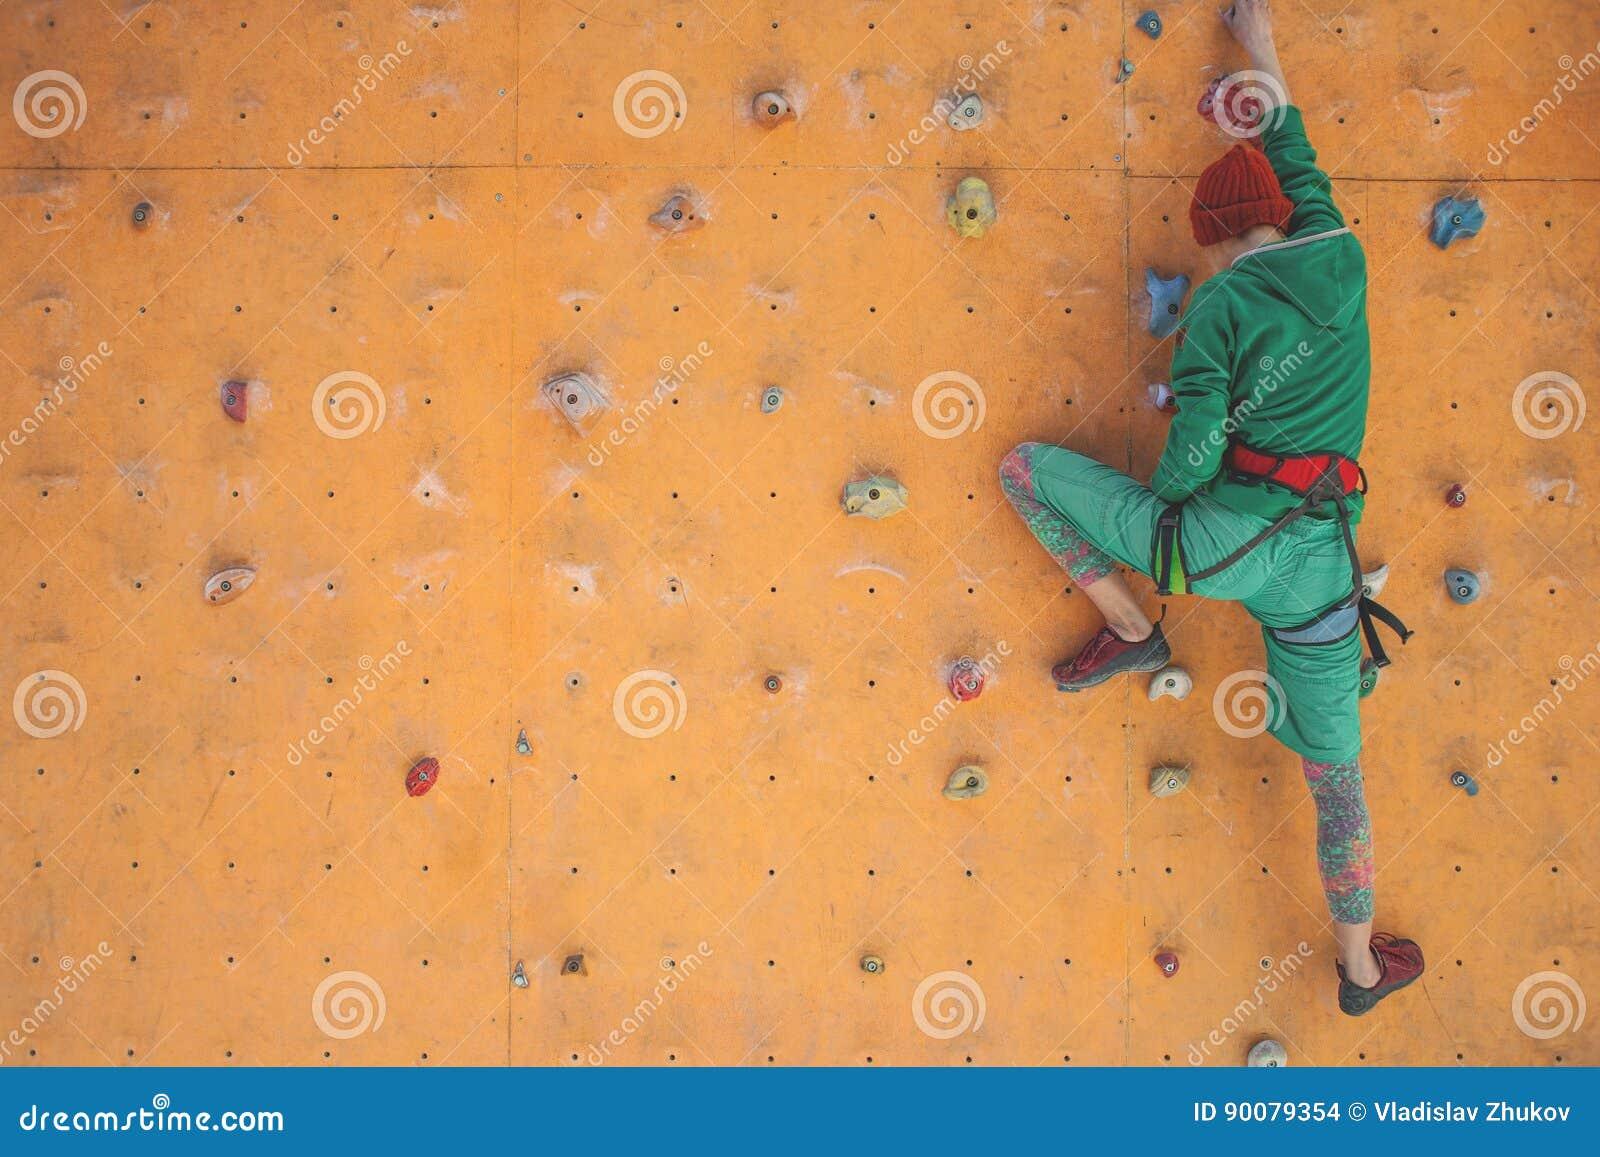 The Girl Climbs On The Climbing Wall. Stock Photo ...